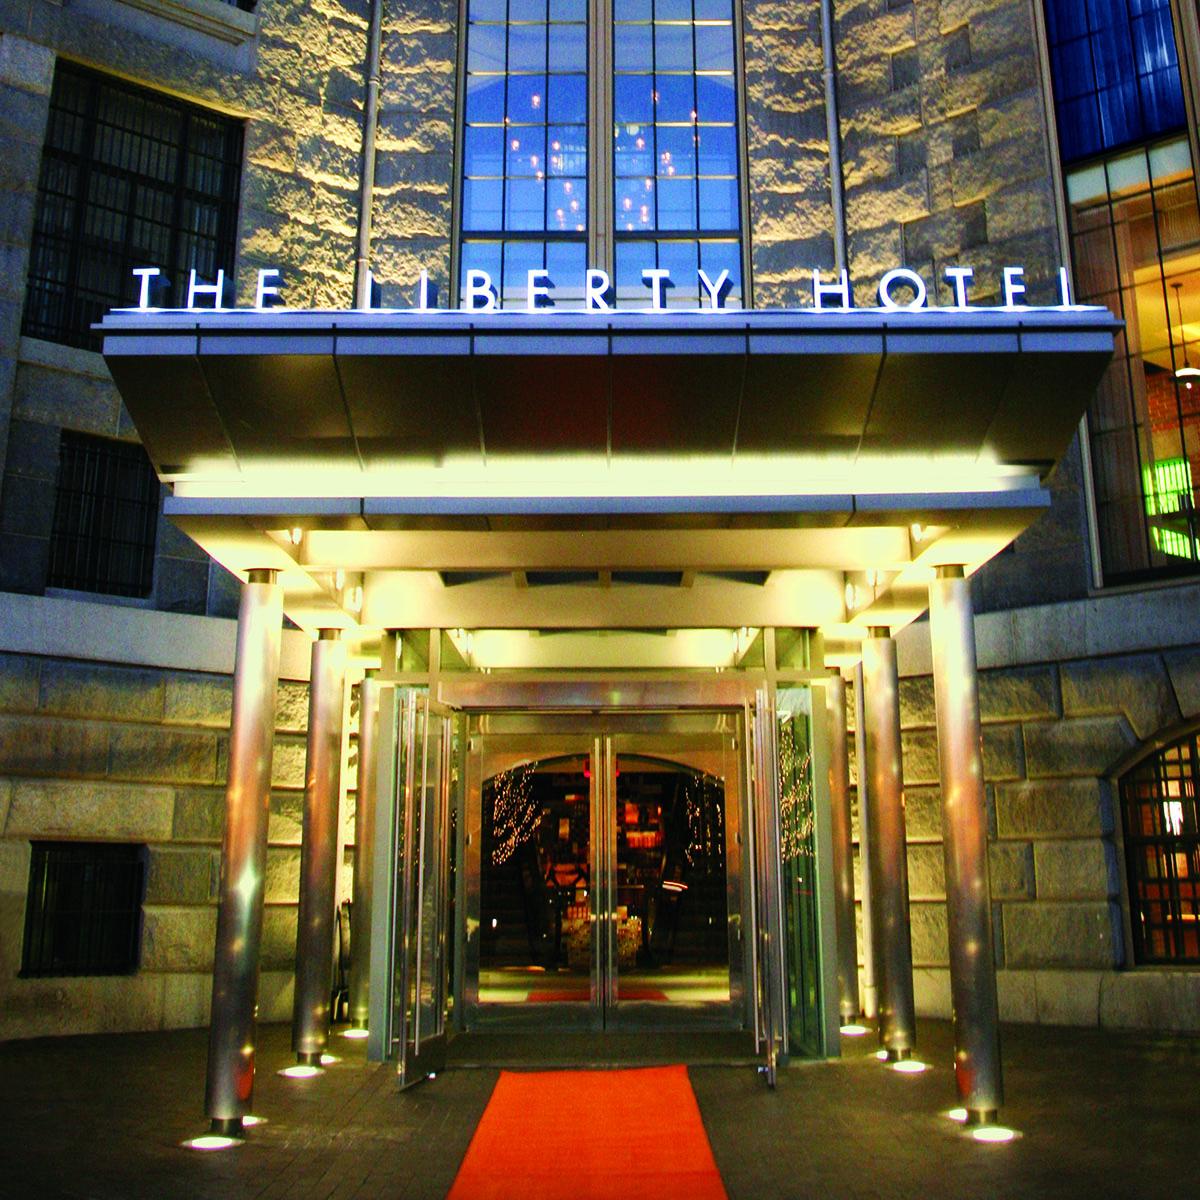 Liberty Hotel entrance